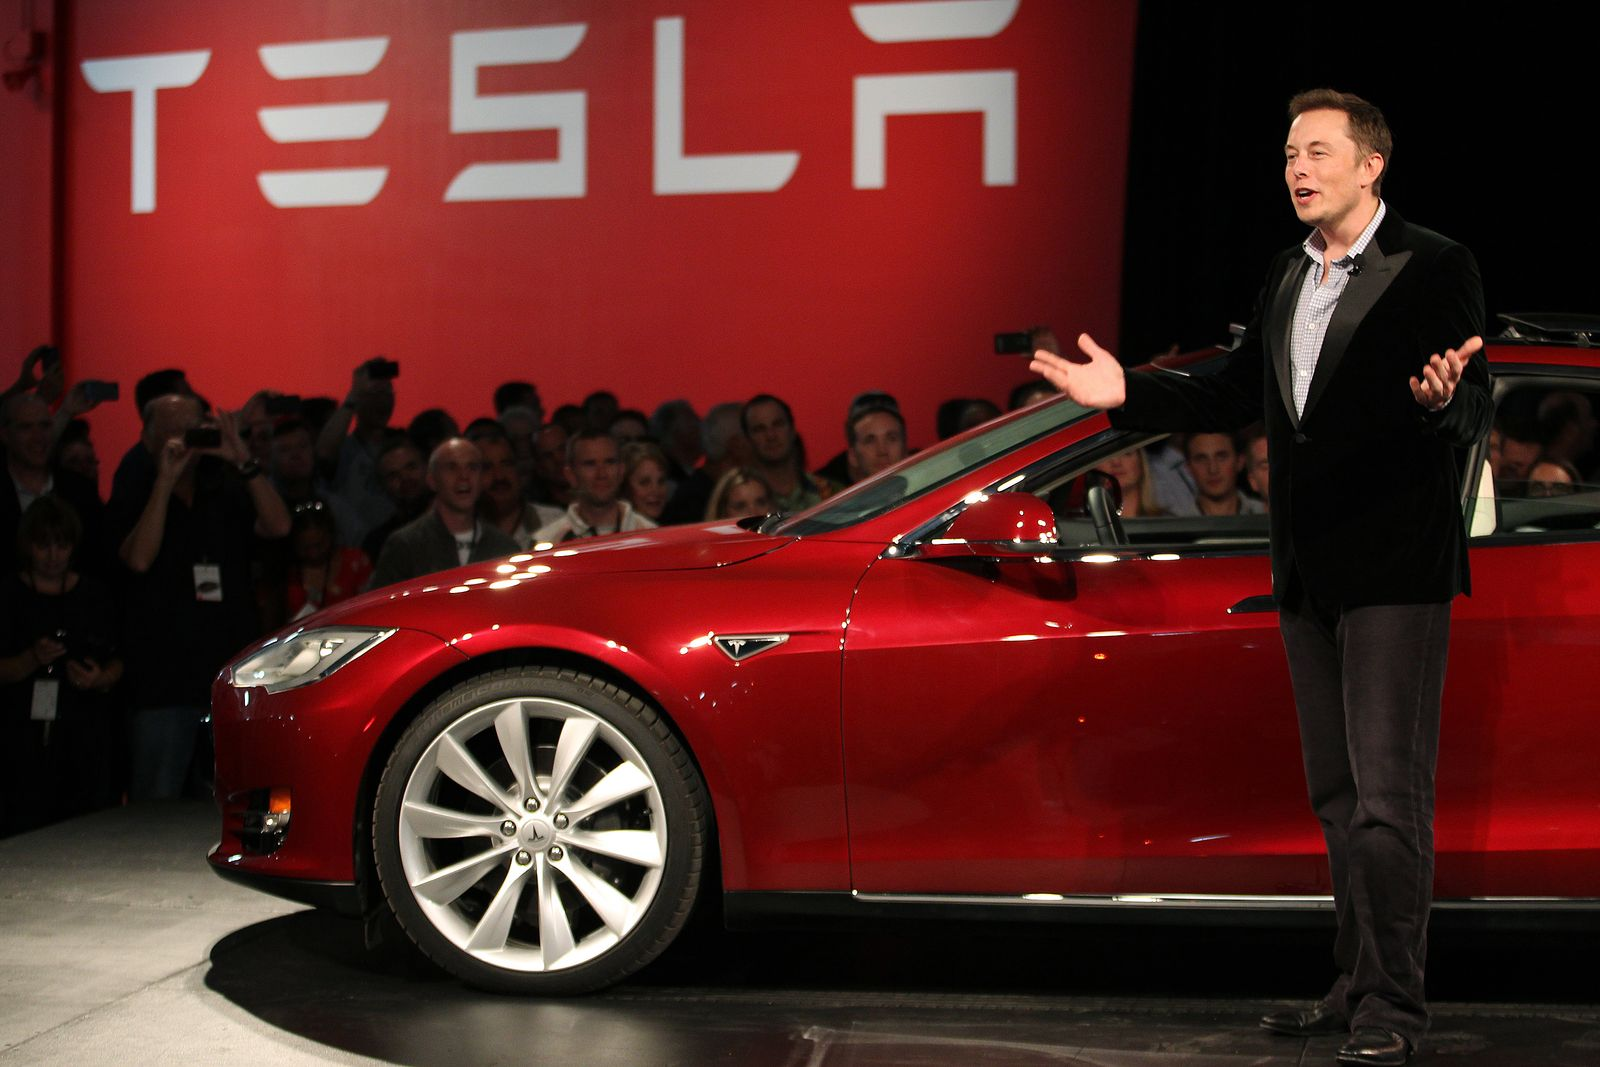 Musk / Tesla Motors